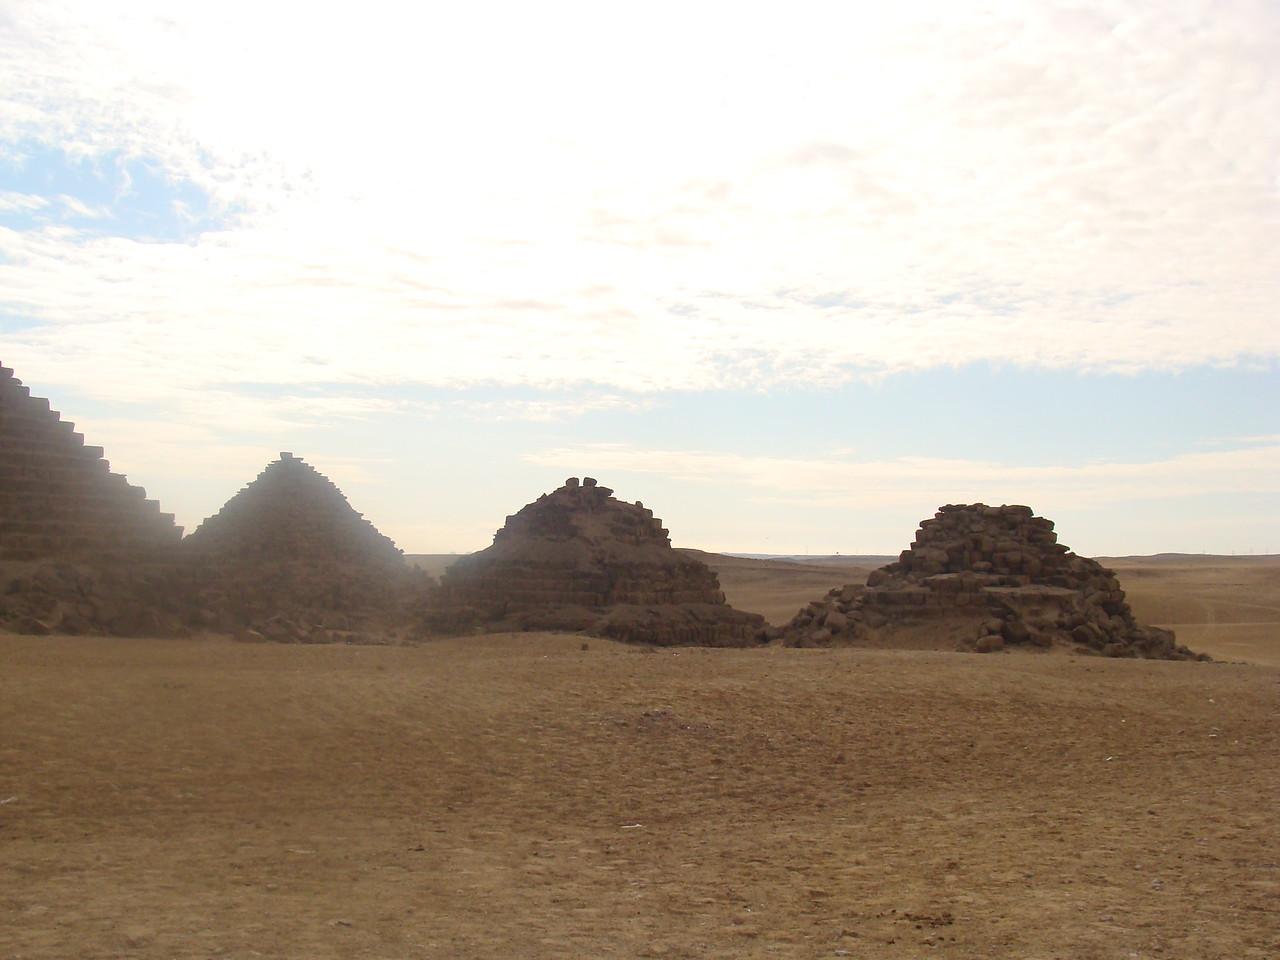 Pharoah's Family Pyramids